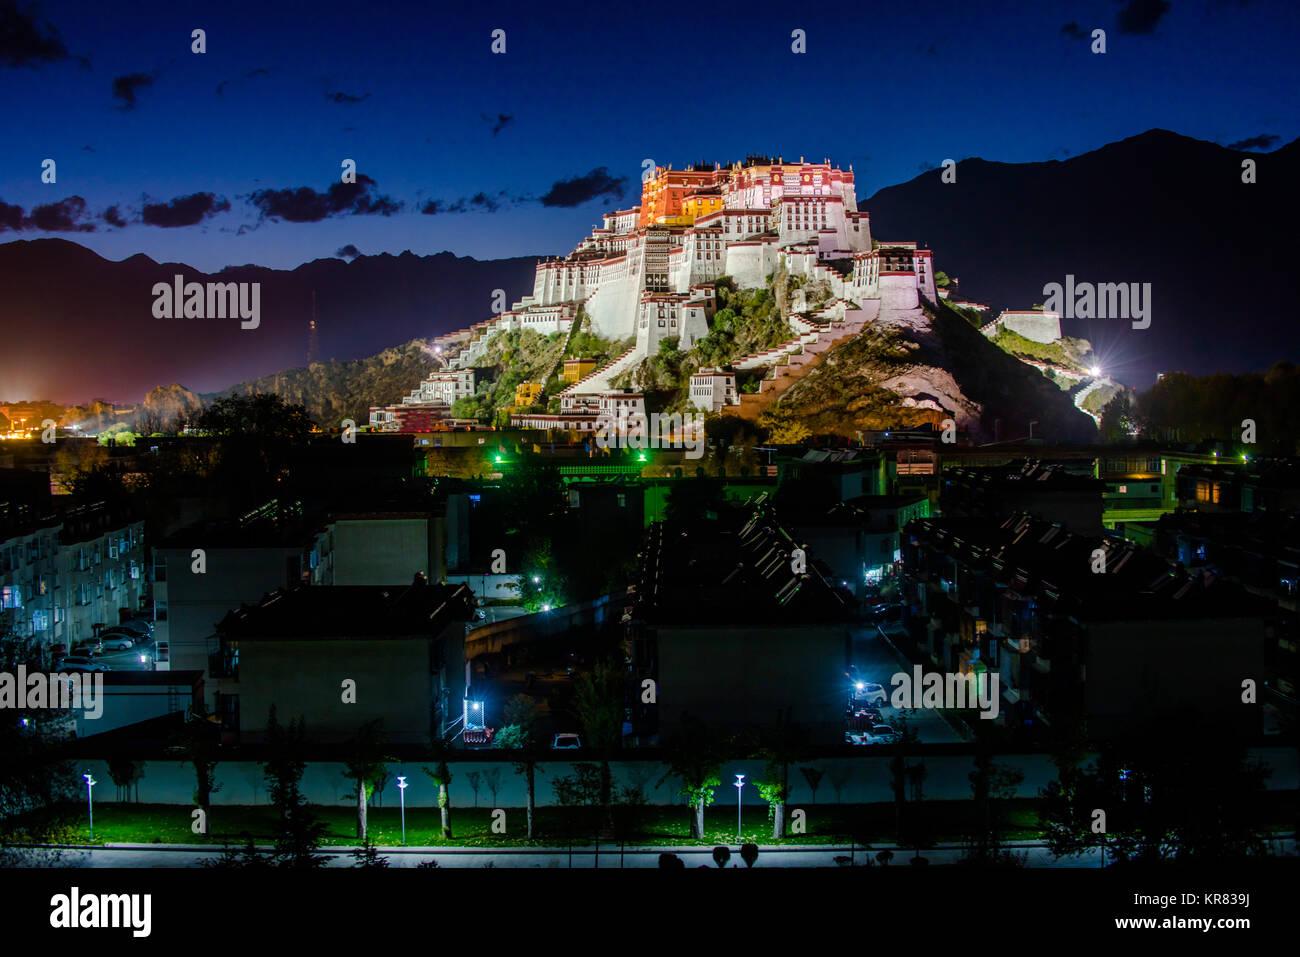 Night view of Potala Palace in Lhasa,Tibet - Stock Image